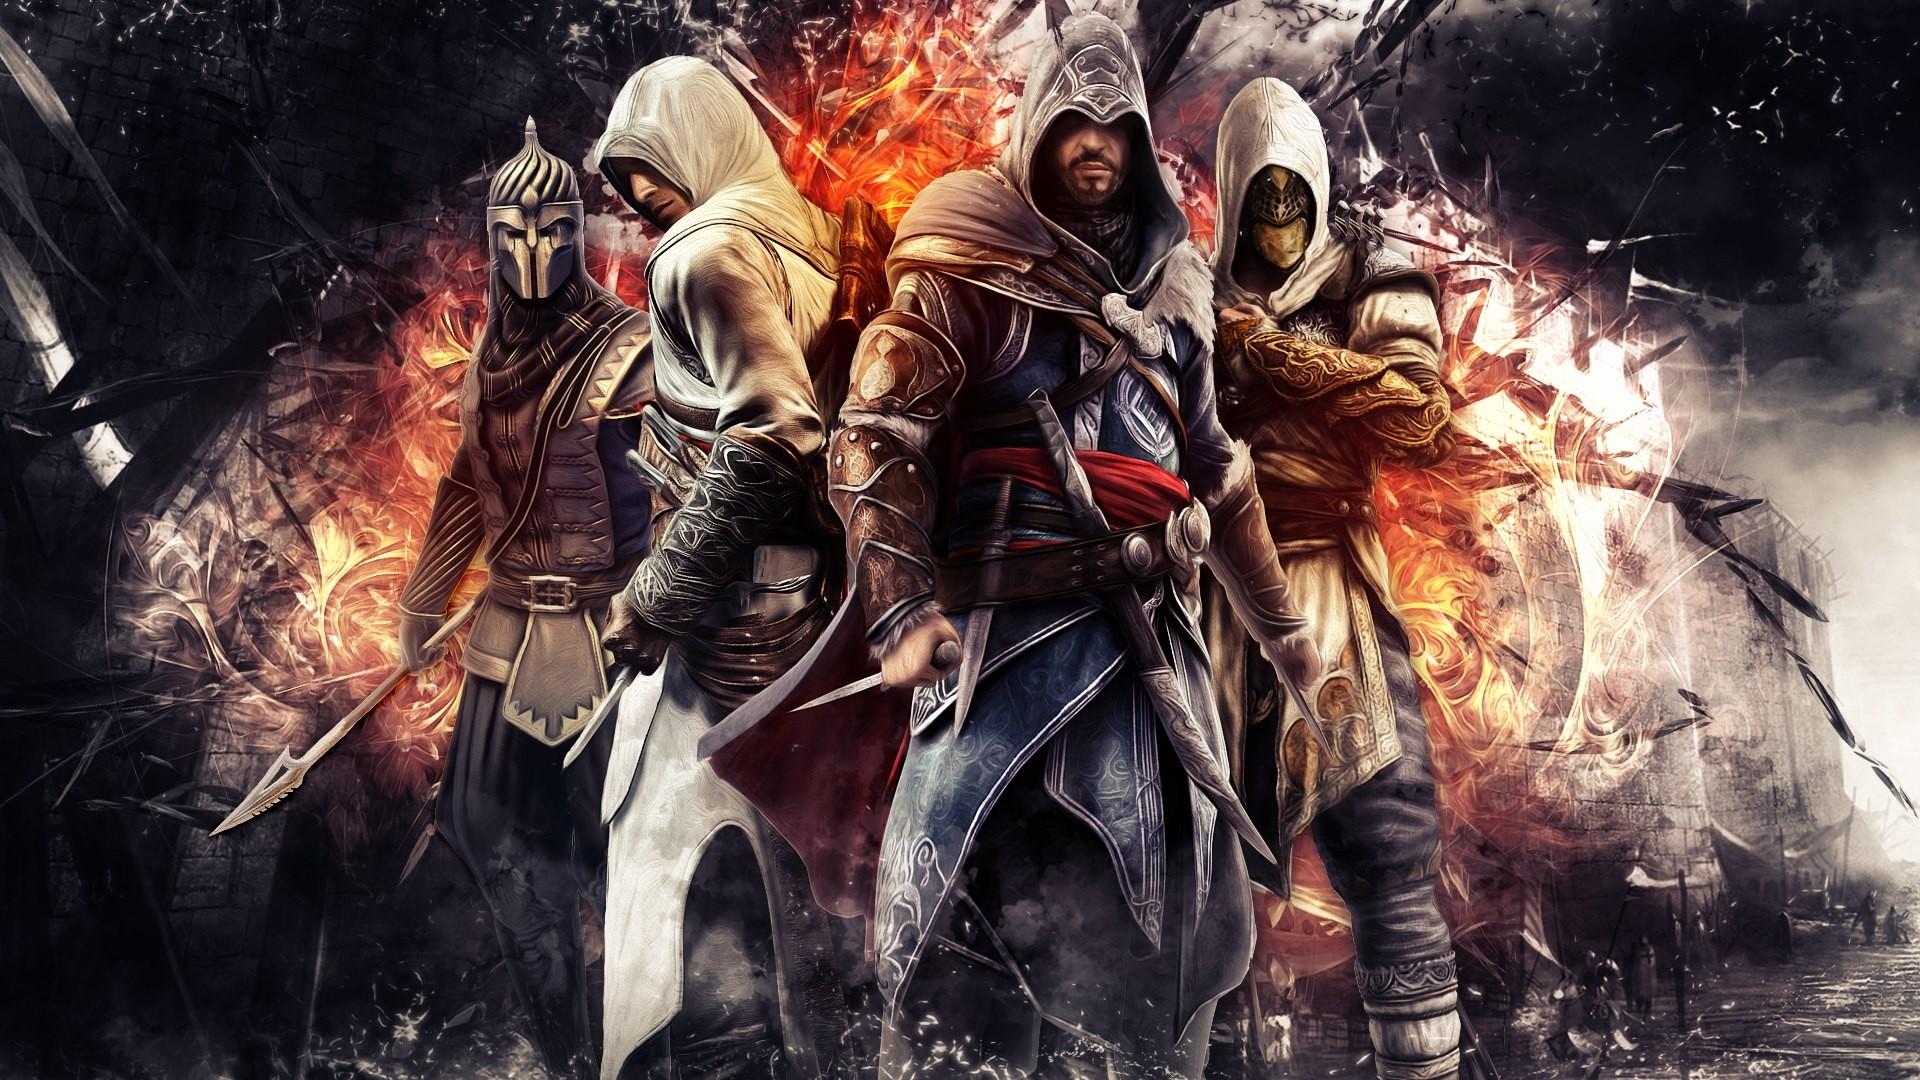 Assassins Creed Wallpaper Epic